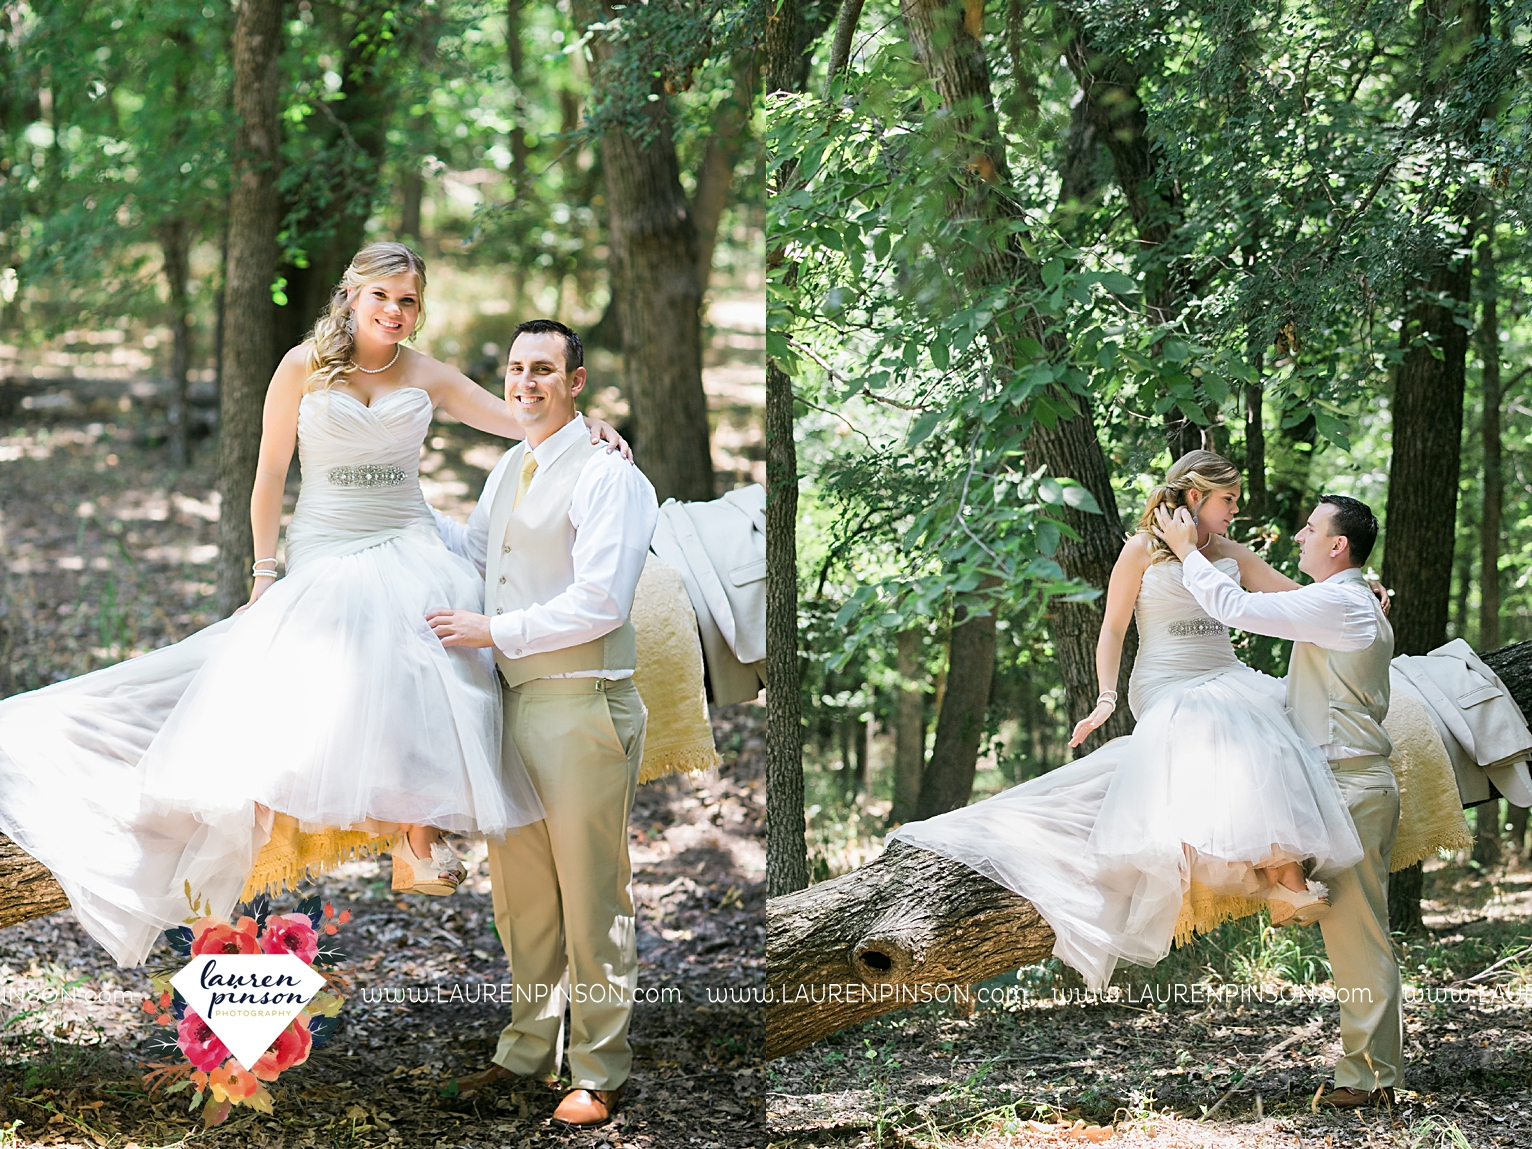 weatherford-texas-hollow-hill-farm-event-wedding-mineral-wells-dfw-wedding-photographer-wichita-falls-photography_3141.jpg